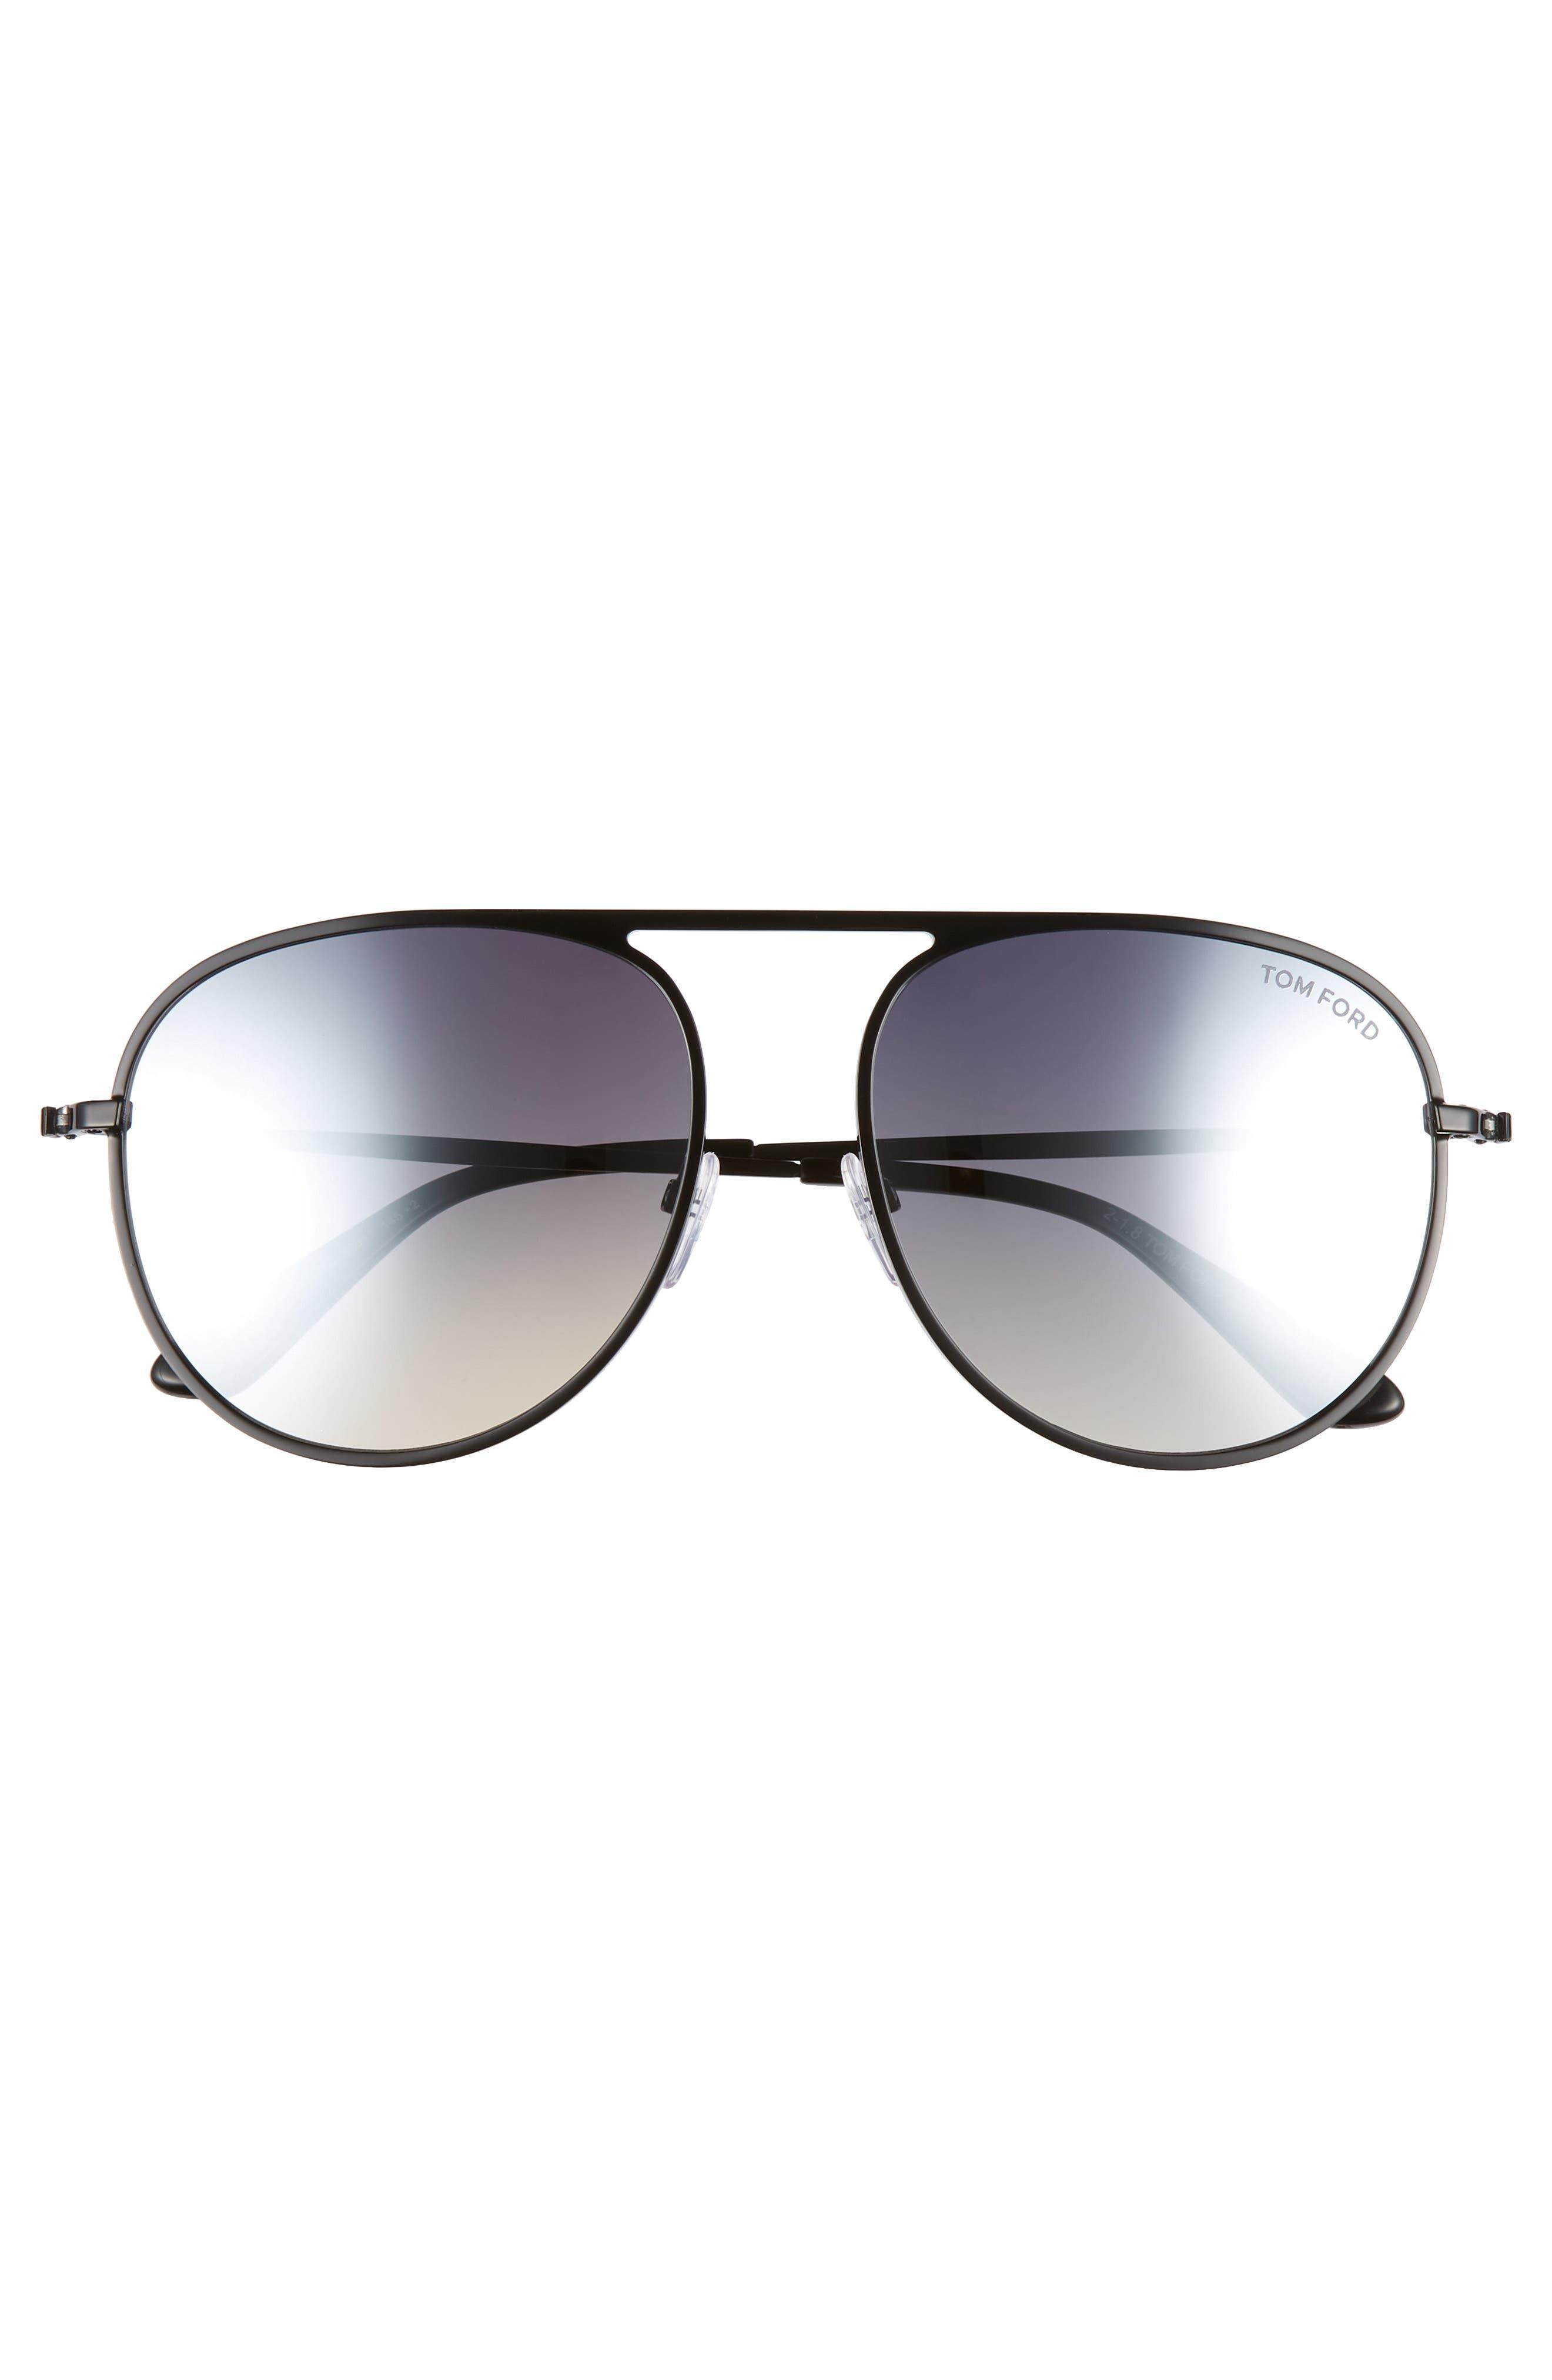 59mm Aviator Sunglasses,                             Alternate thumbnail 3, color,                             SHINY BLACK/ SMOKE MIRROR